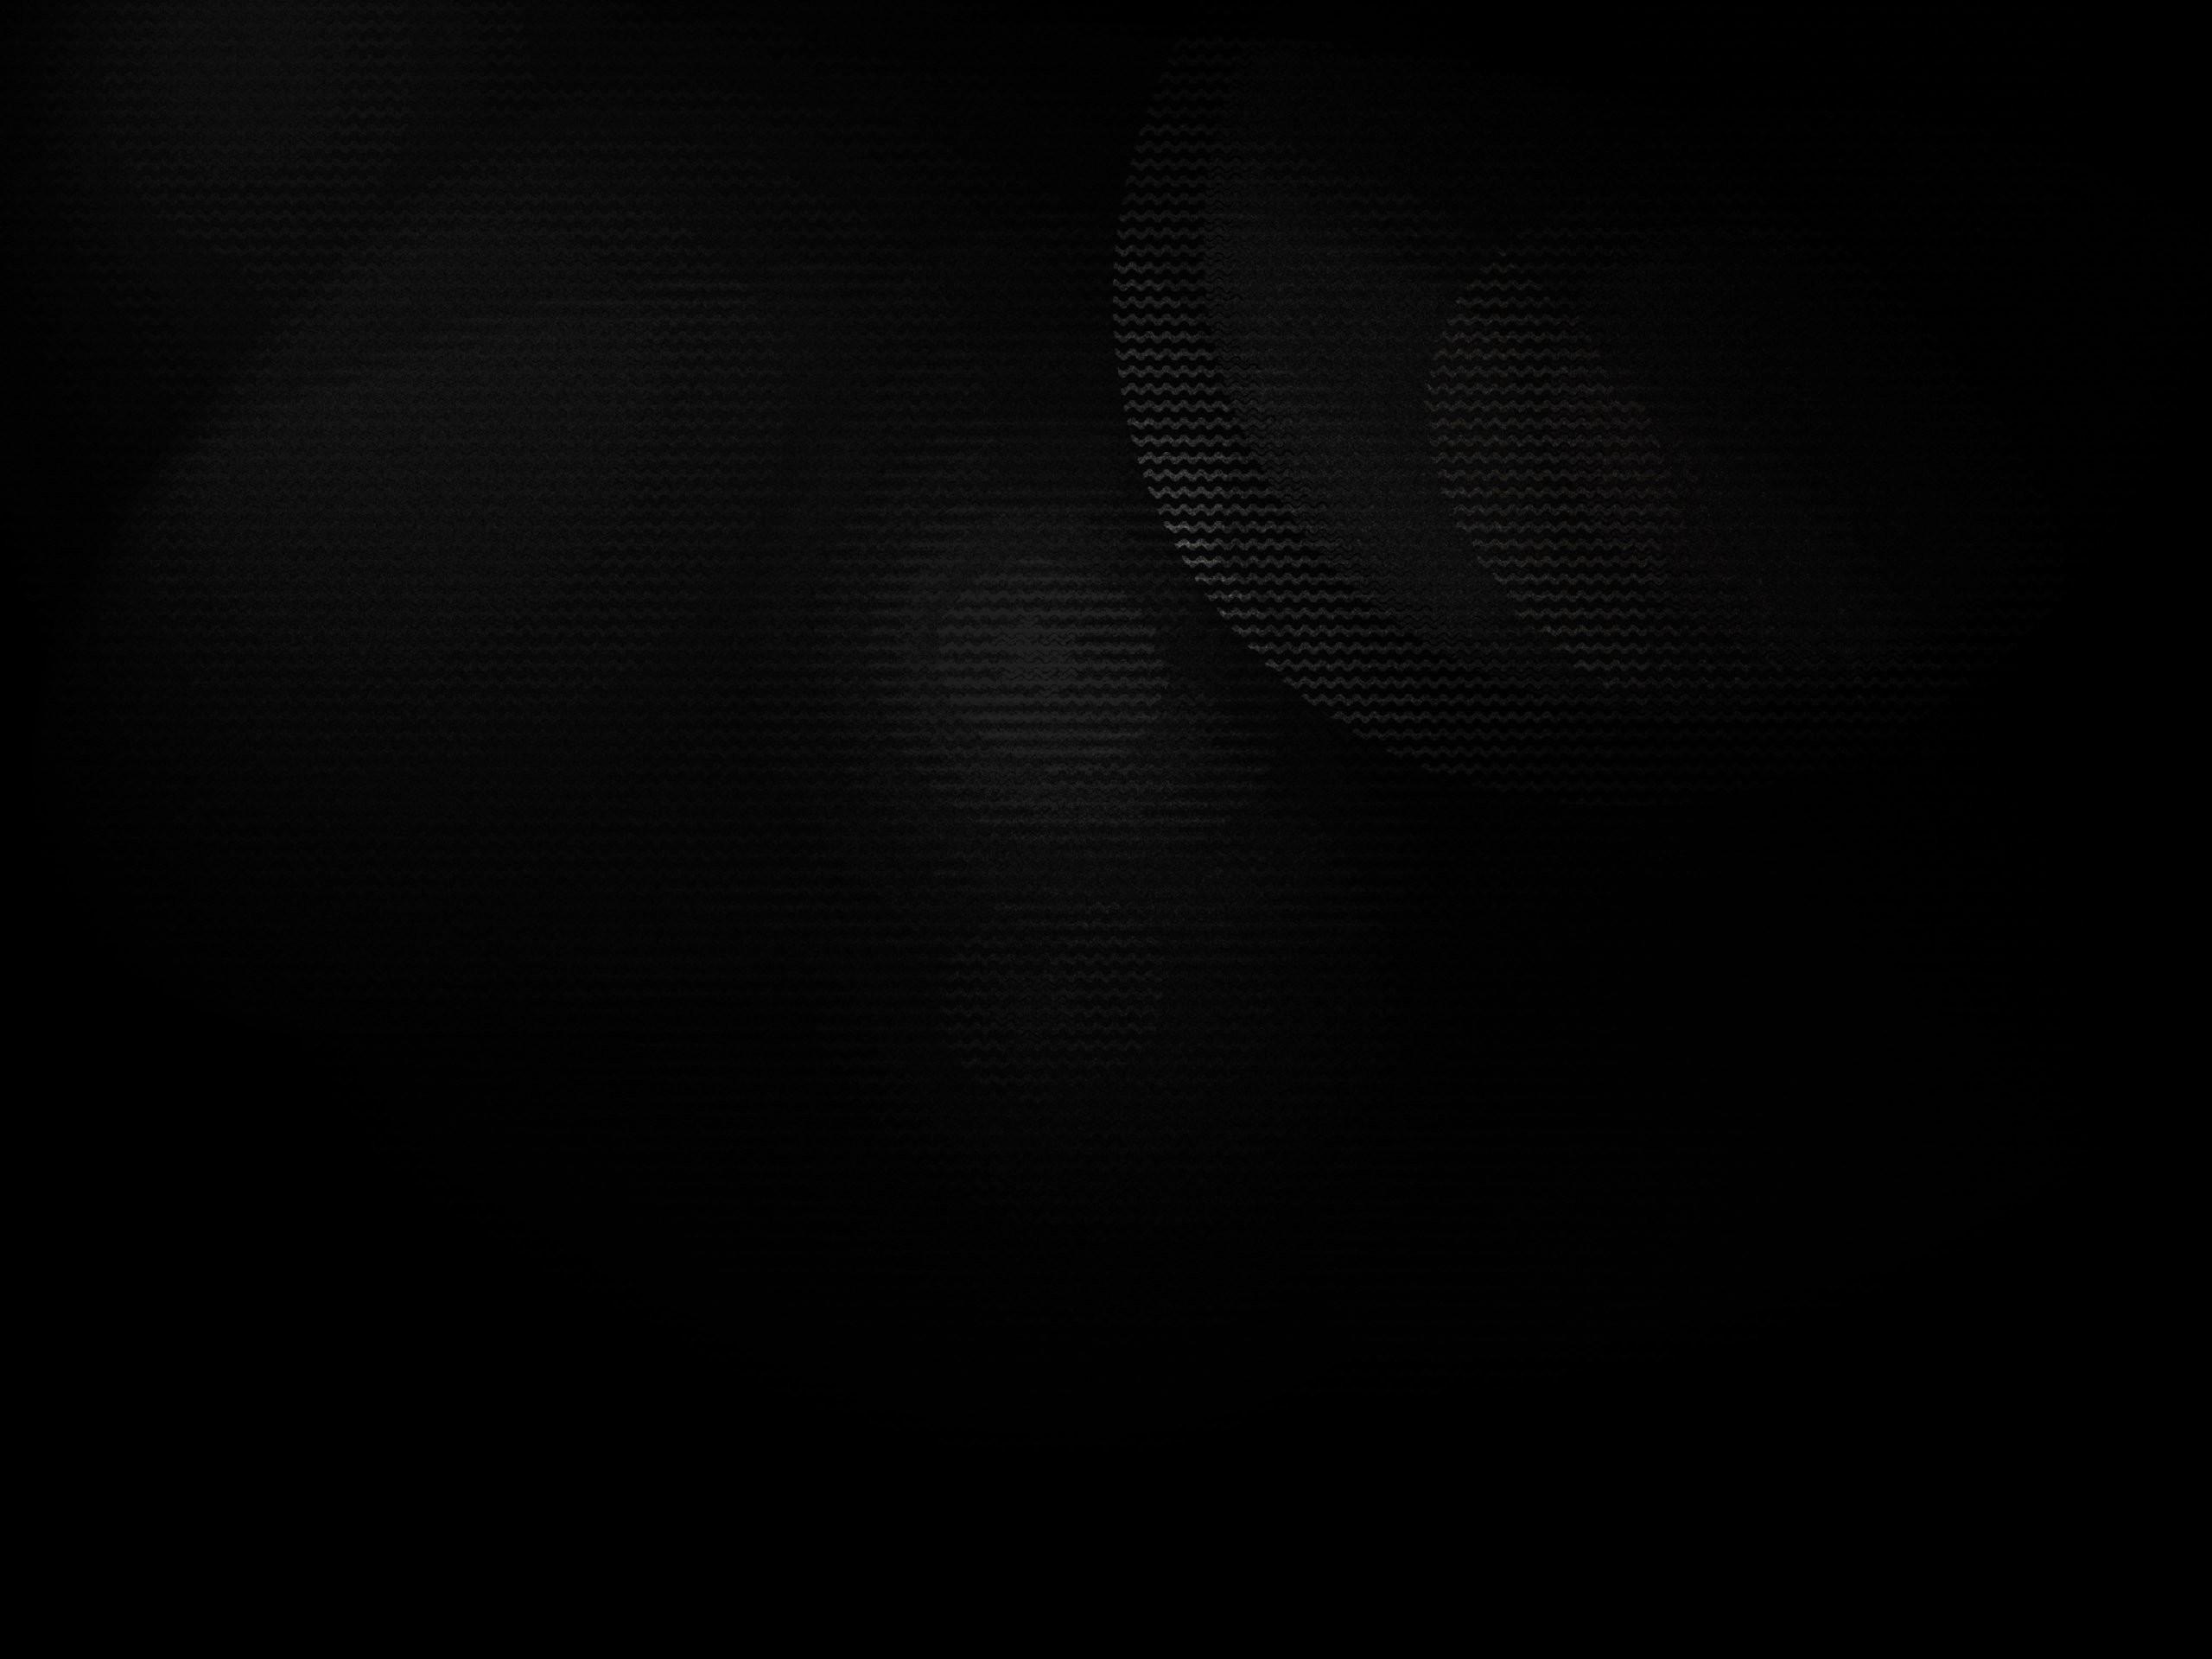 Abstract dark pattern digital grunge grayscale wallpaper      307124   WallpaperUP